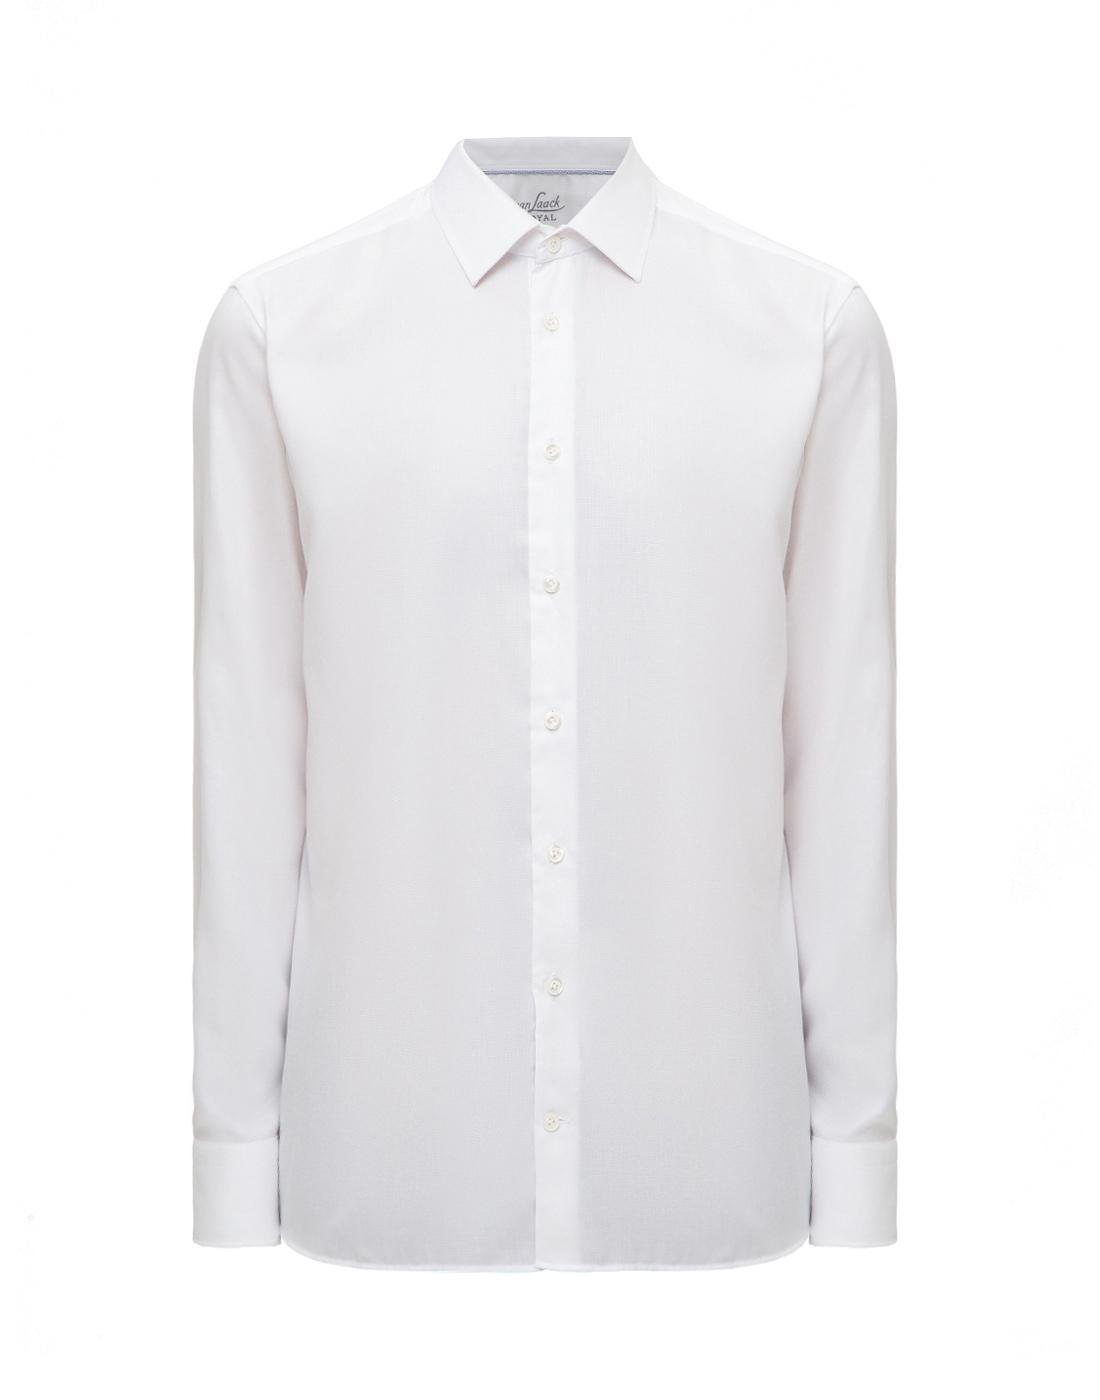 Мужская белая рубашка Van Laack S150021/000-1